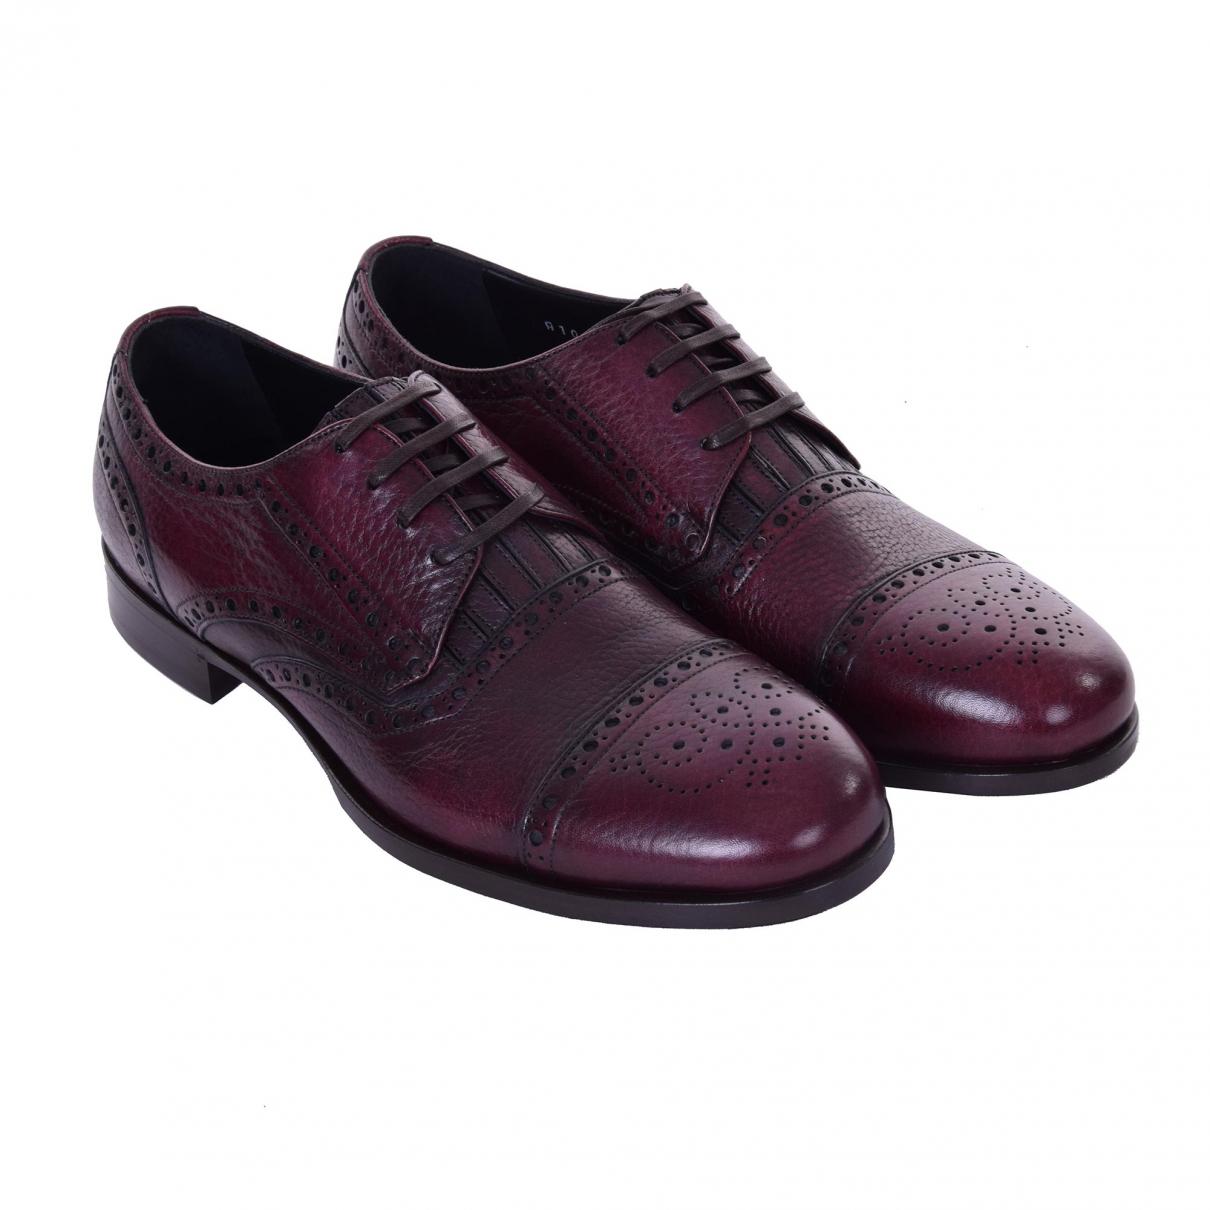 Dolce & Gabbana \N Burgundy Leather Lace ups for Men 41 EU